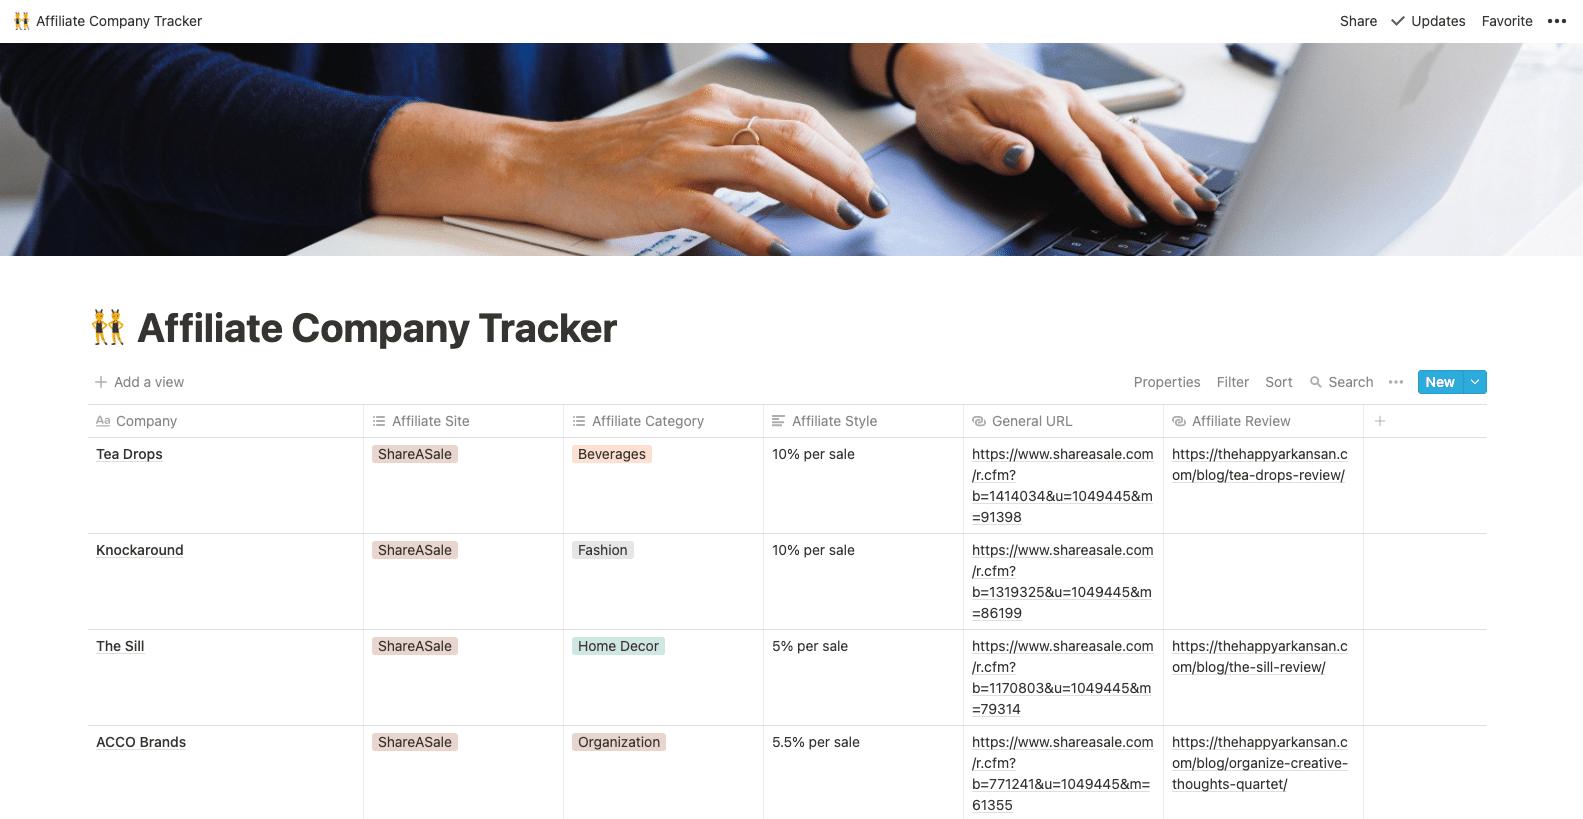 tha-affiliate-company-tracker